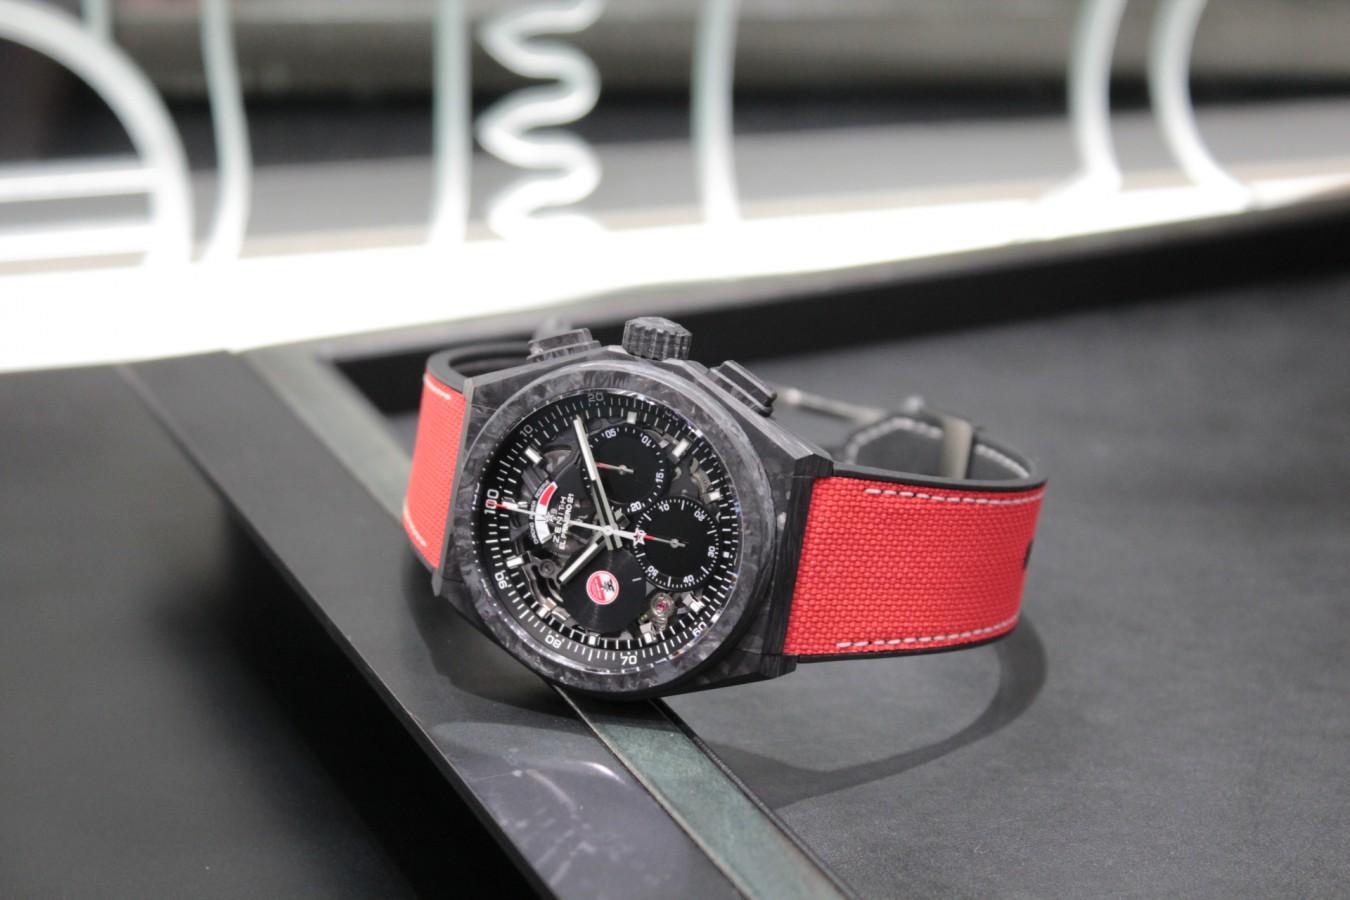 IMG_5906 赤と黒のコントラストがカッコ良い!?世界200本限定のスペシャルモデル「デファイ エル・プリメロ21 カール・コックス エディション」 - DEFY